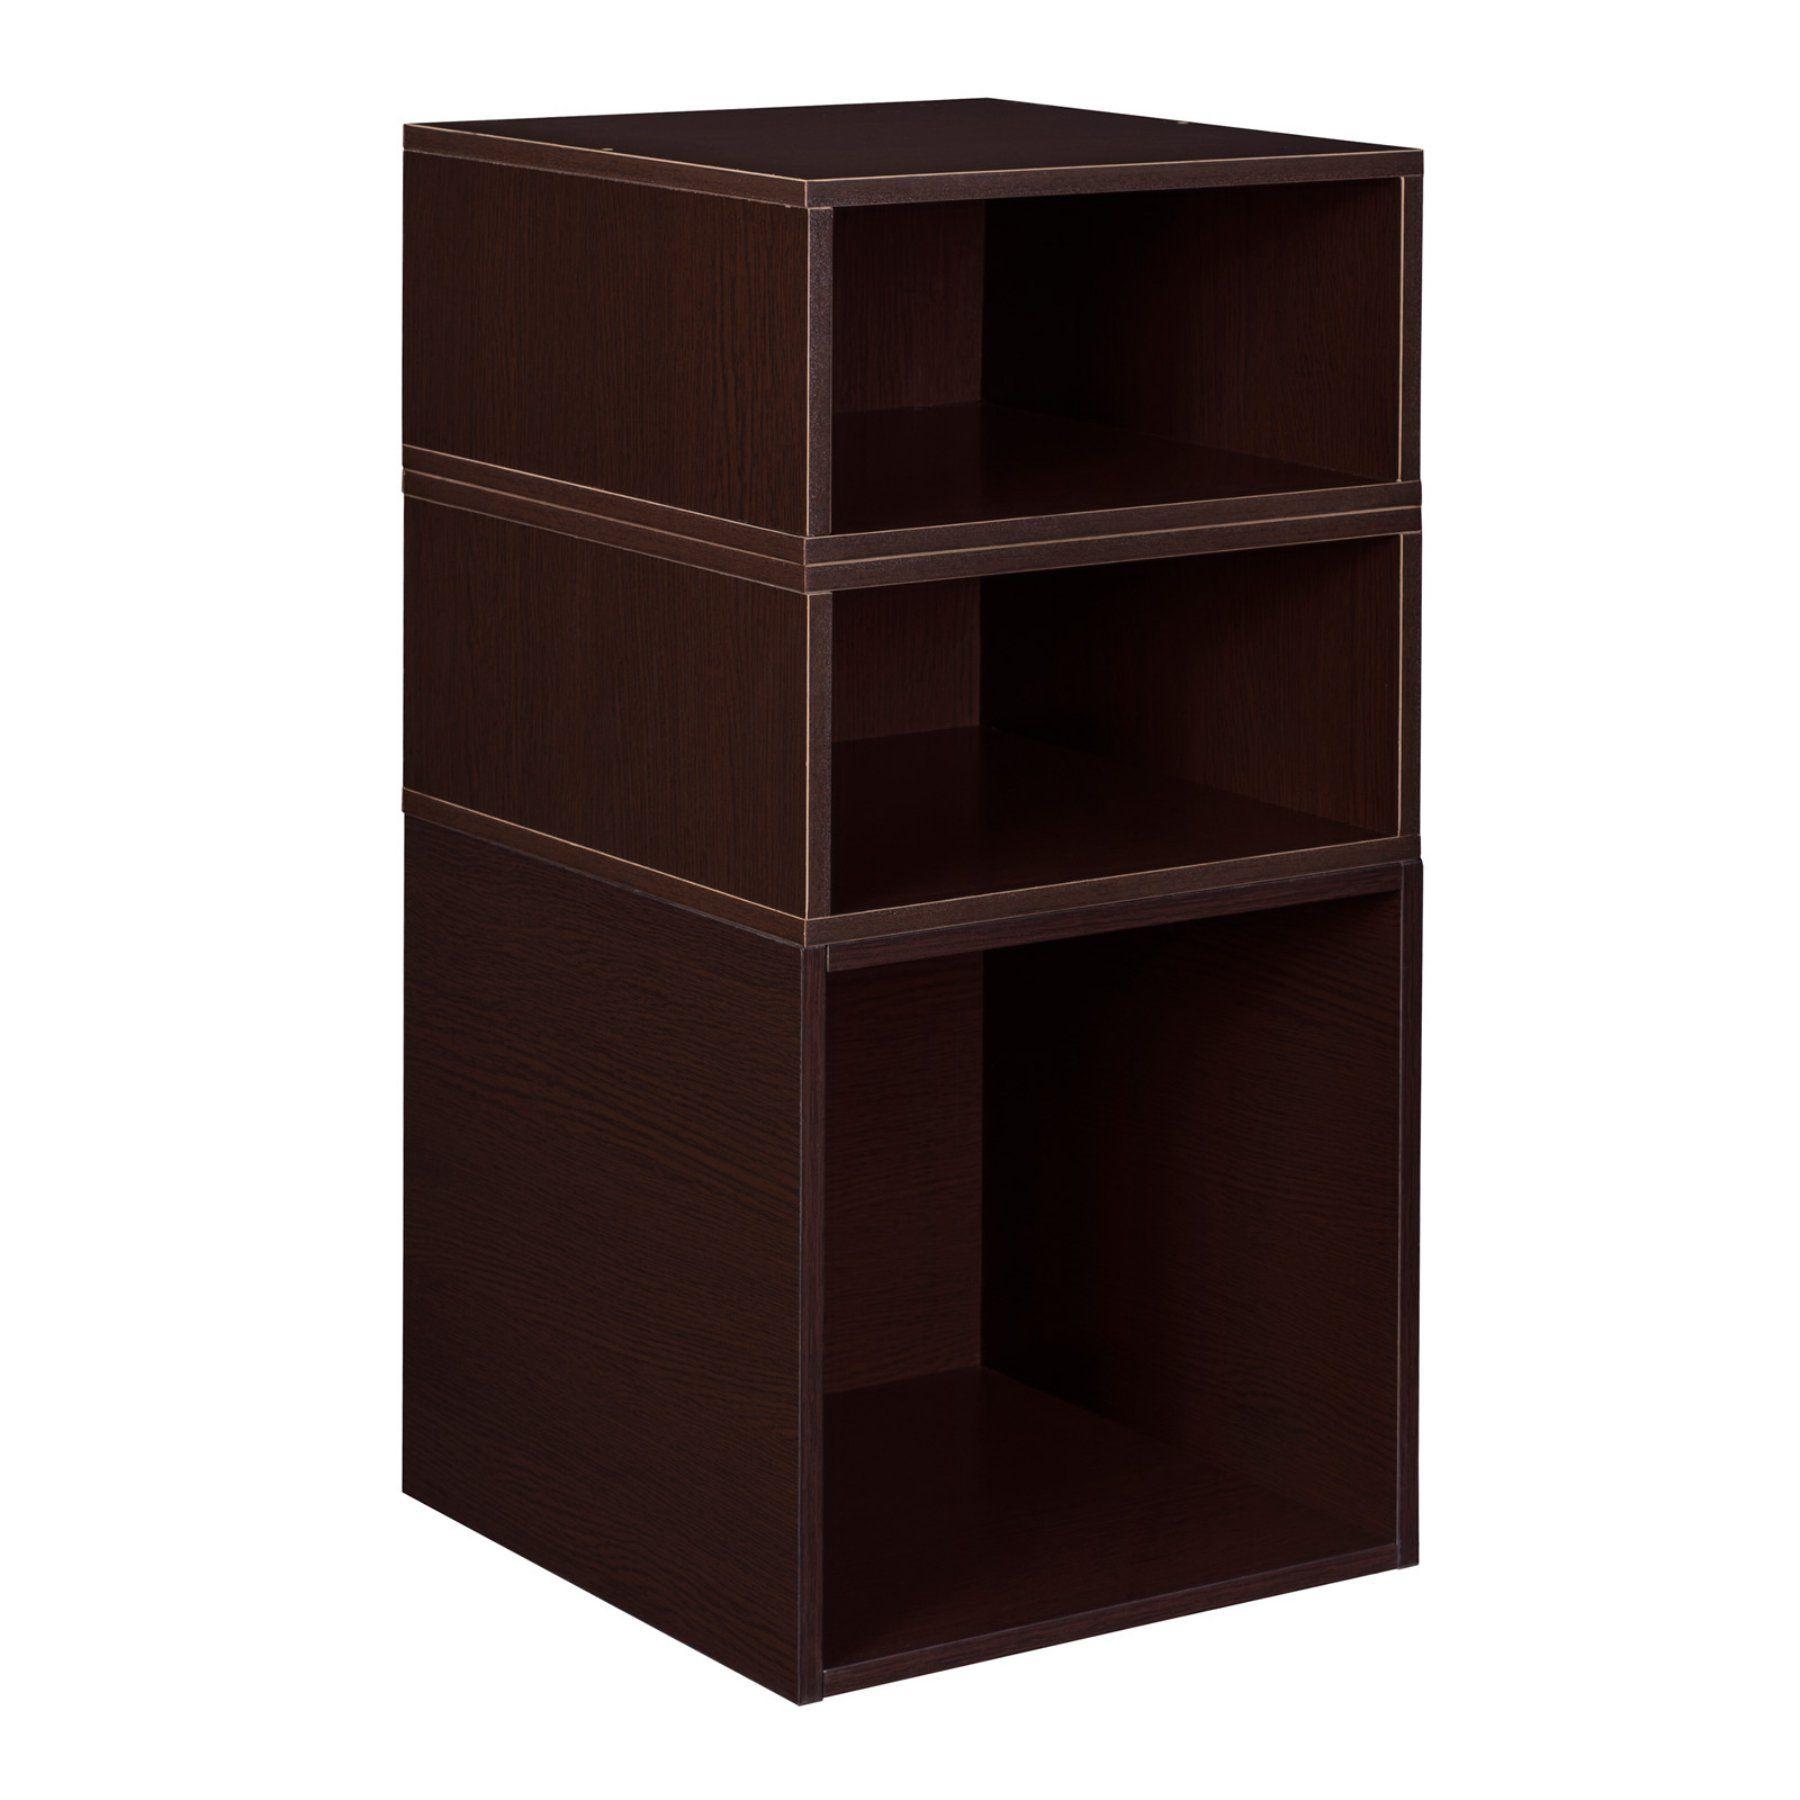 Regency Niche Cubo Modular Storage Shelf With Optional 1 Full